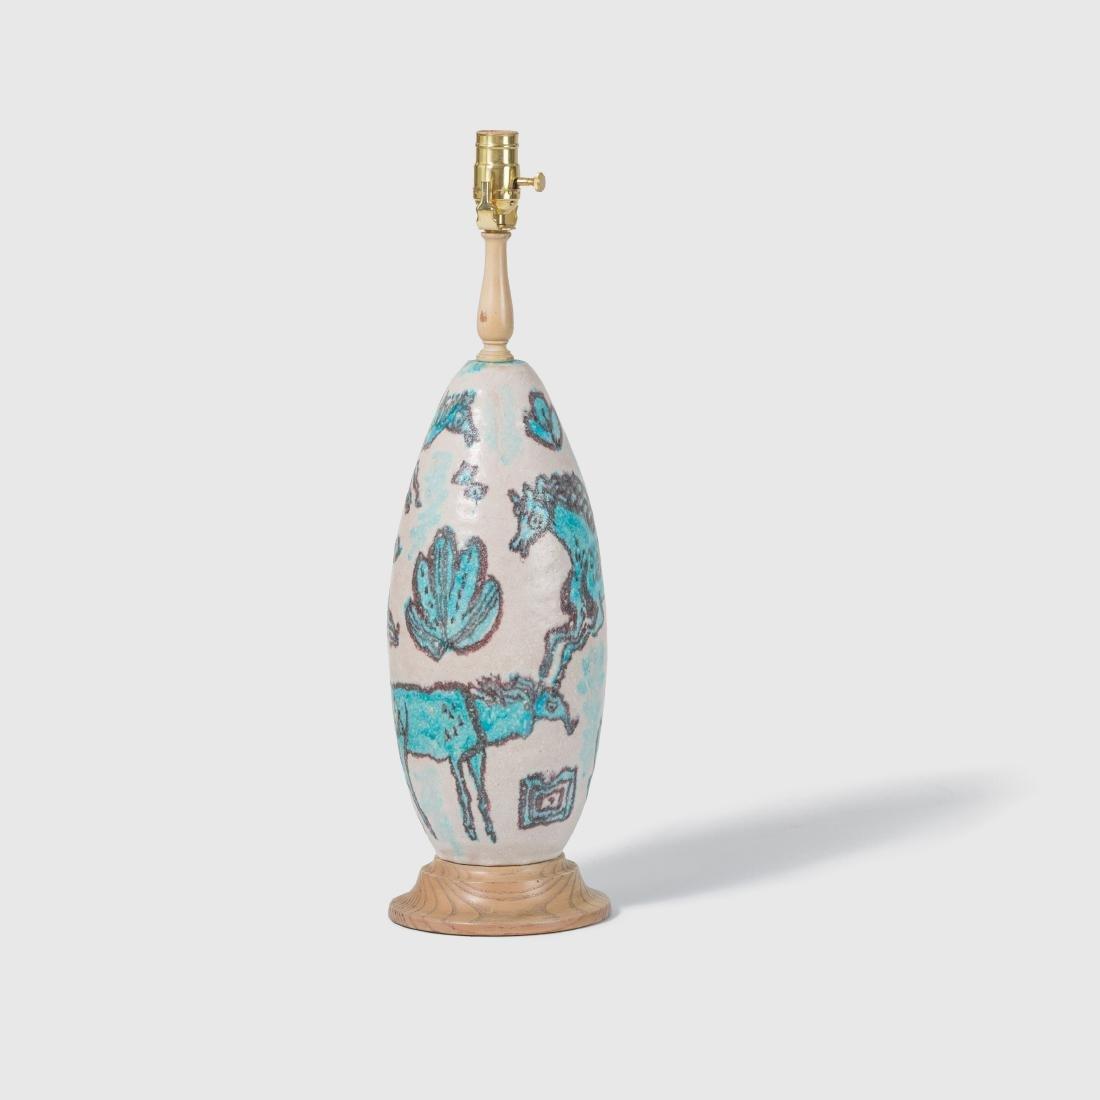 Guido Gambone Table Lamp